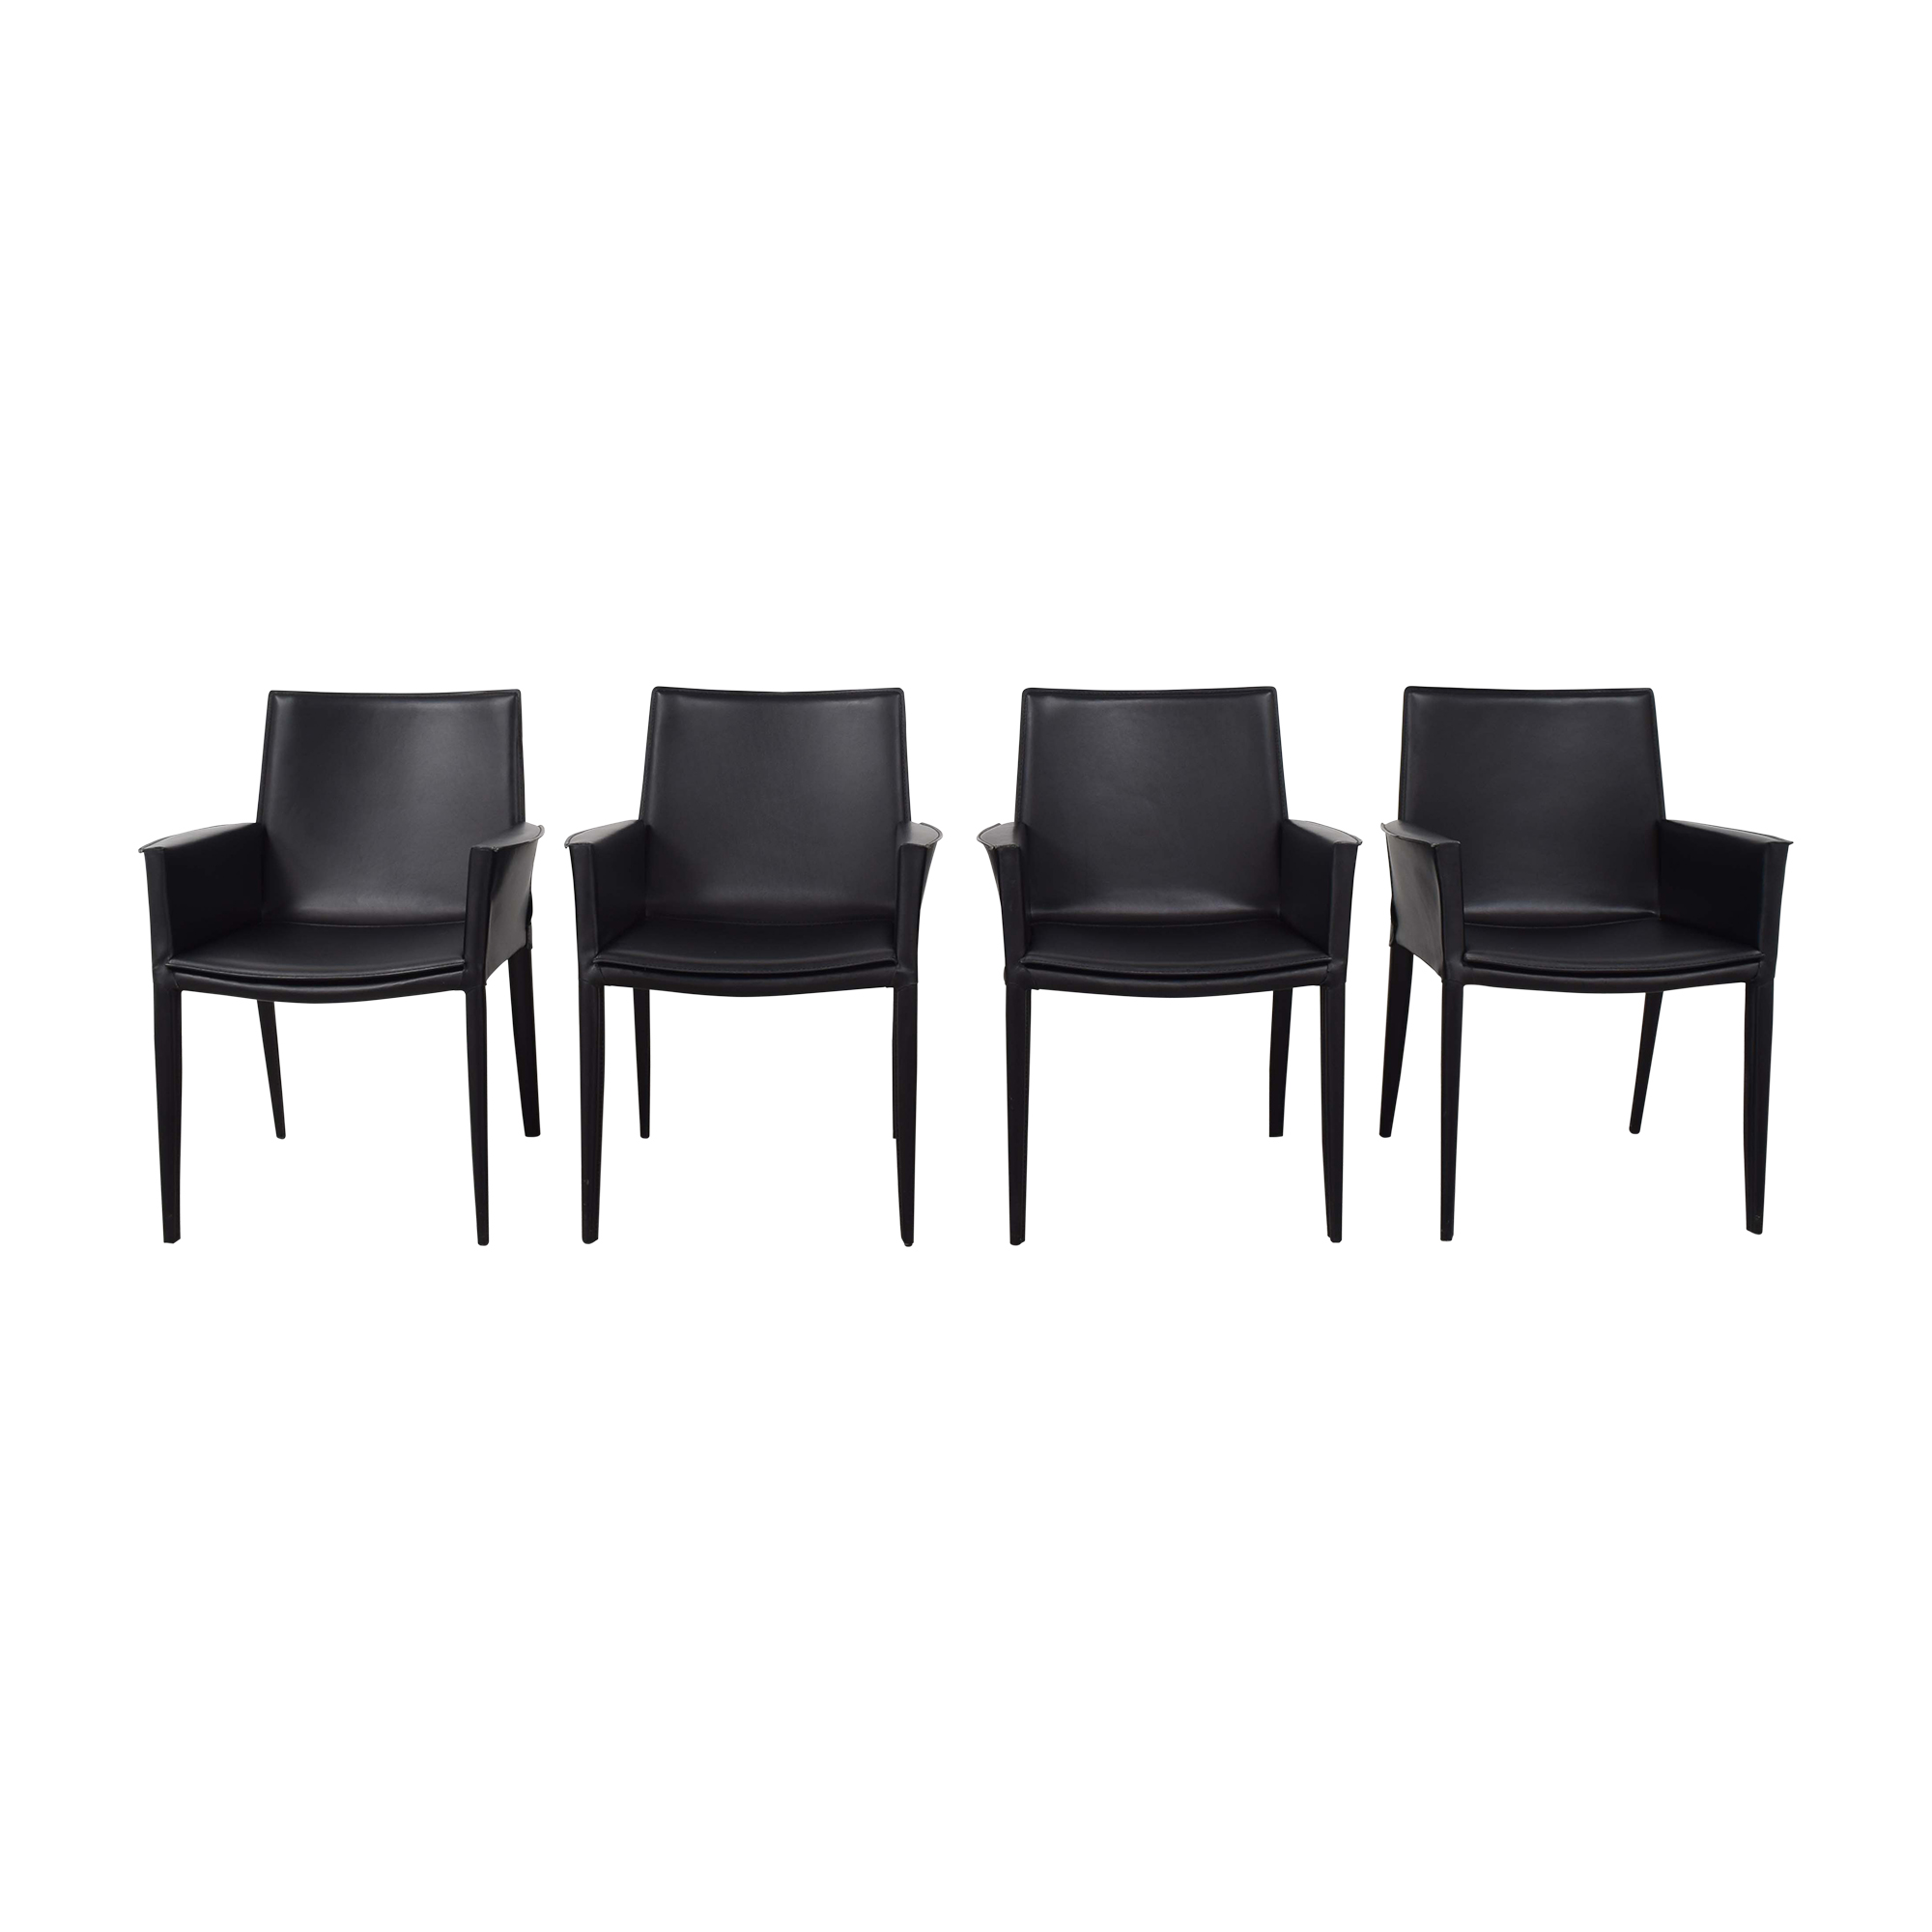 sohoConcept sohoConcept Tiffany Dining Chairs